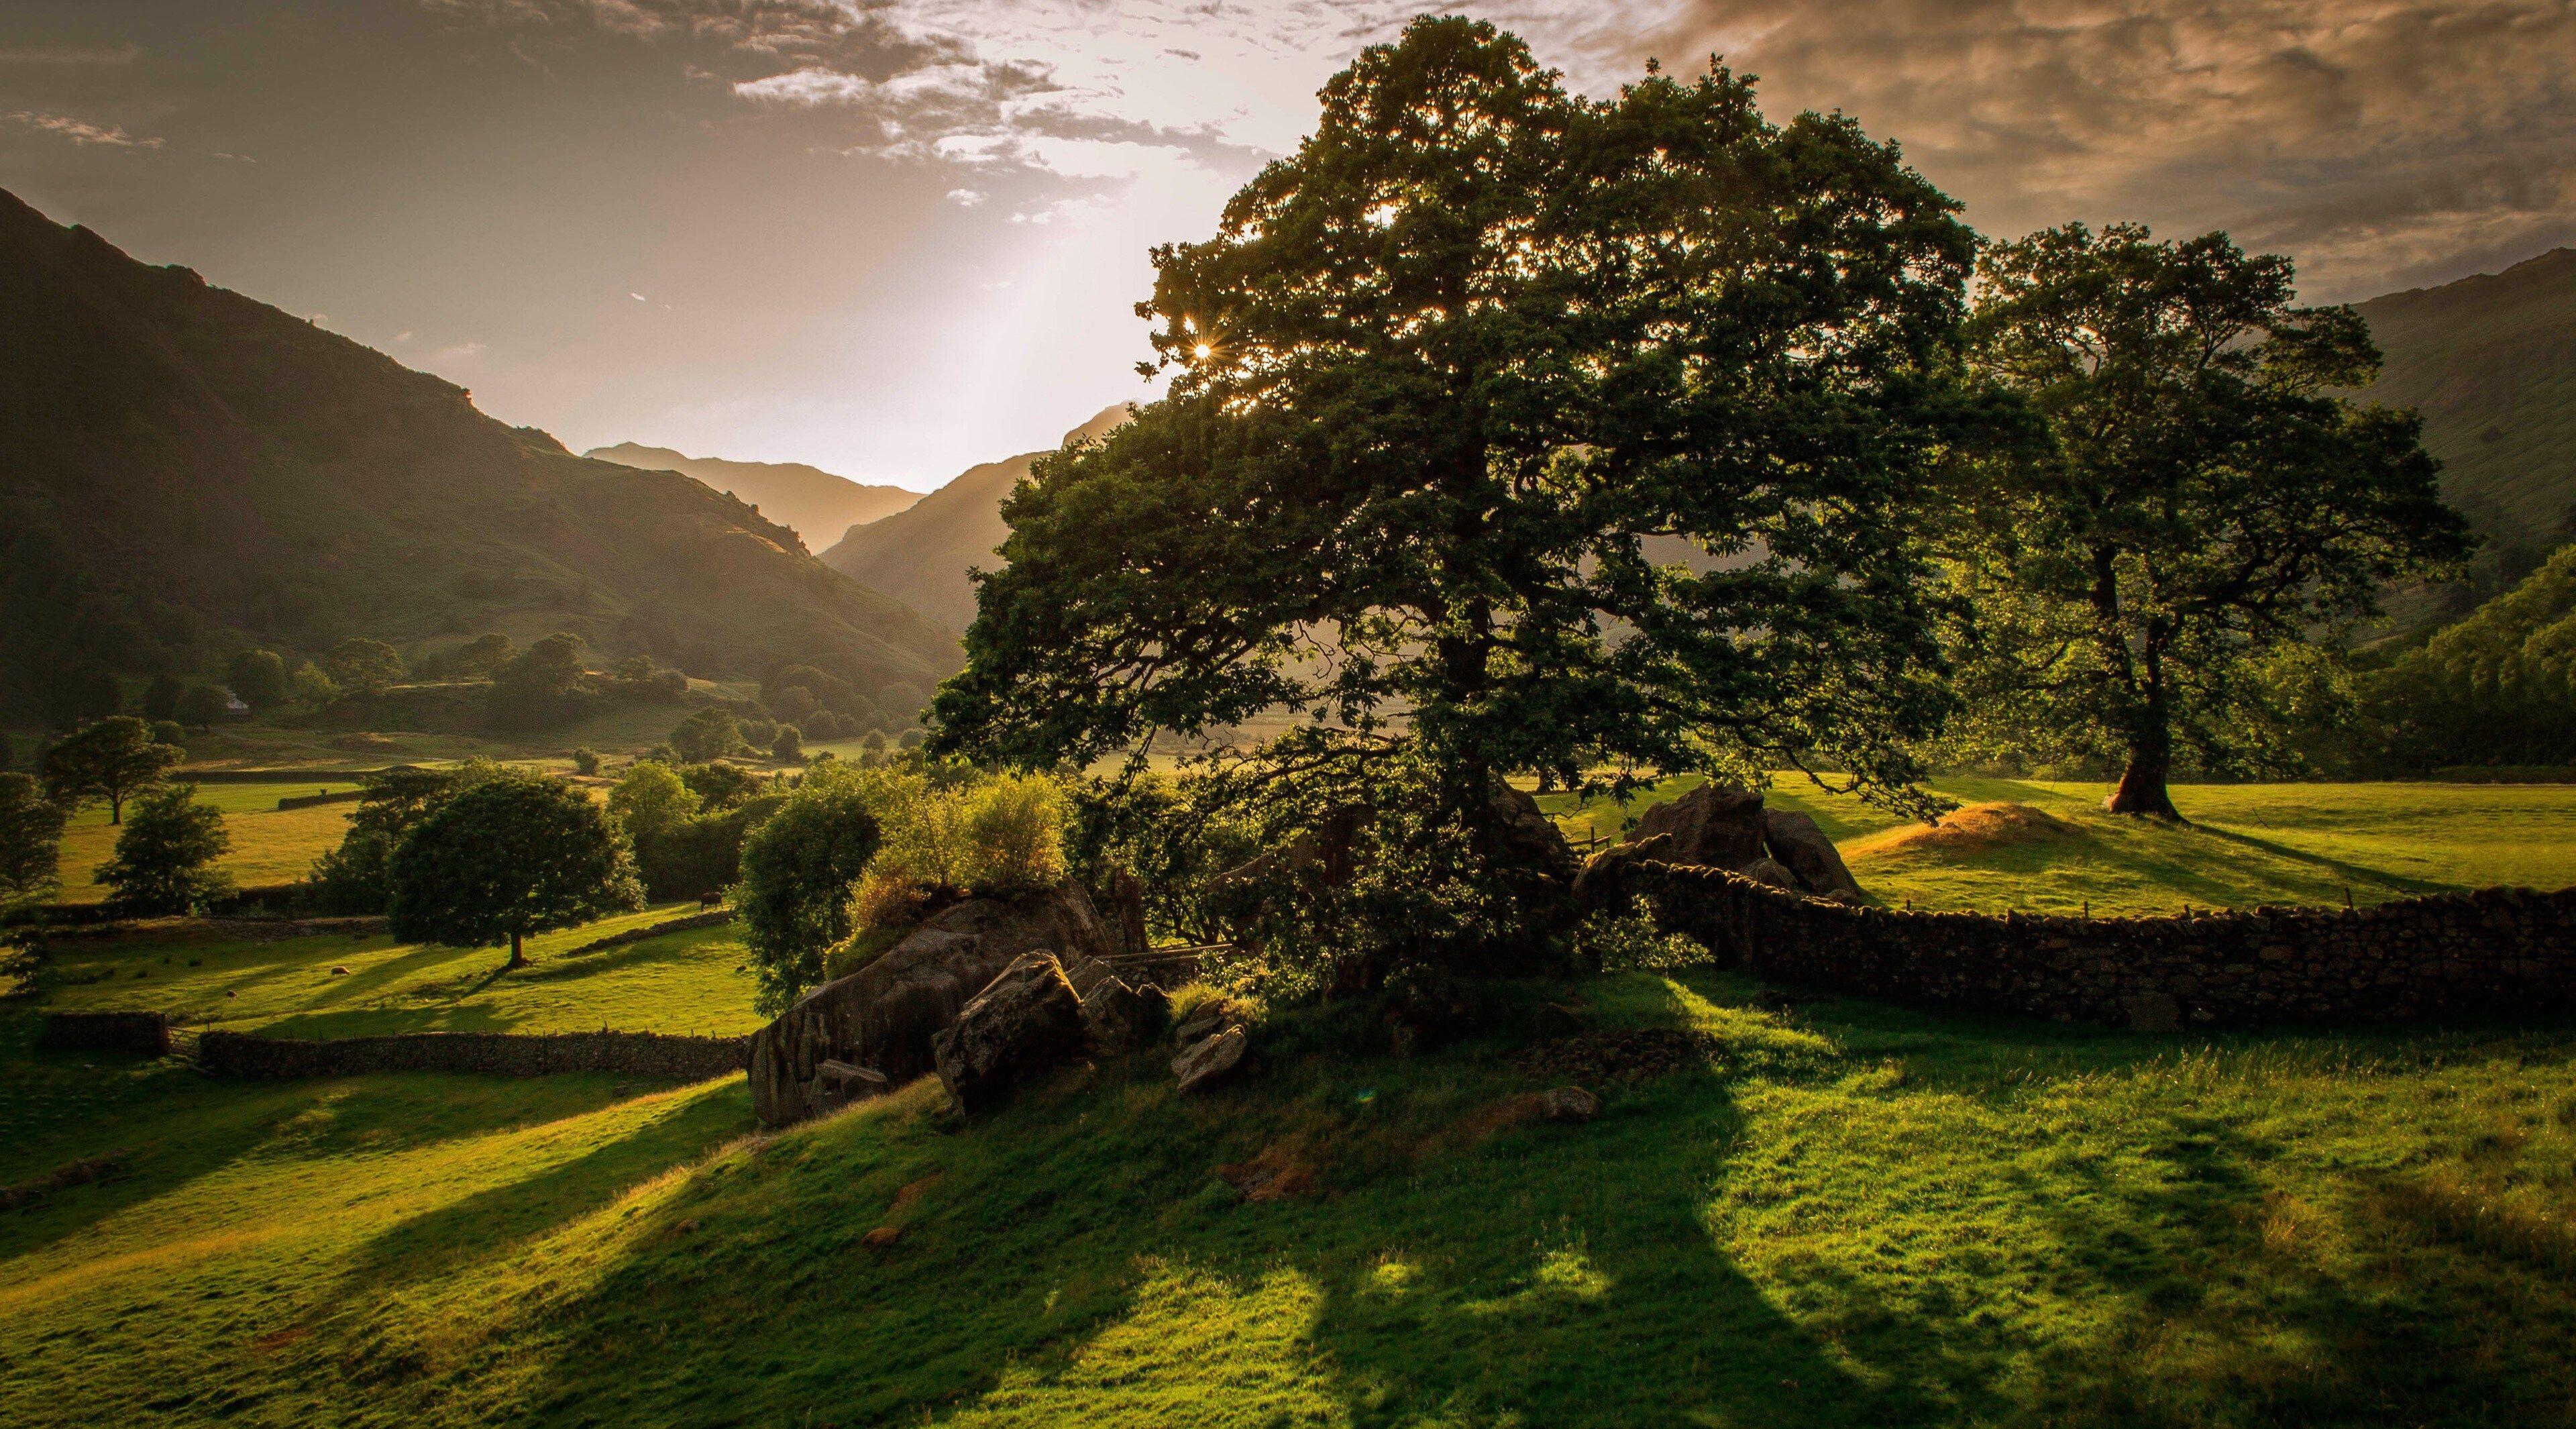 3840x2130 Ireland 4k Background Hd Wallpaper Irish Landscape Landscape Trees Nature Hd